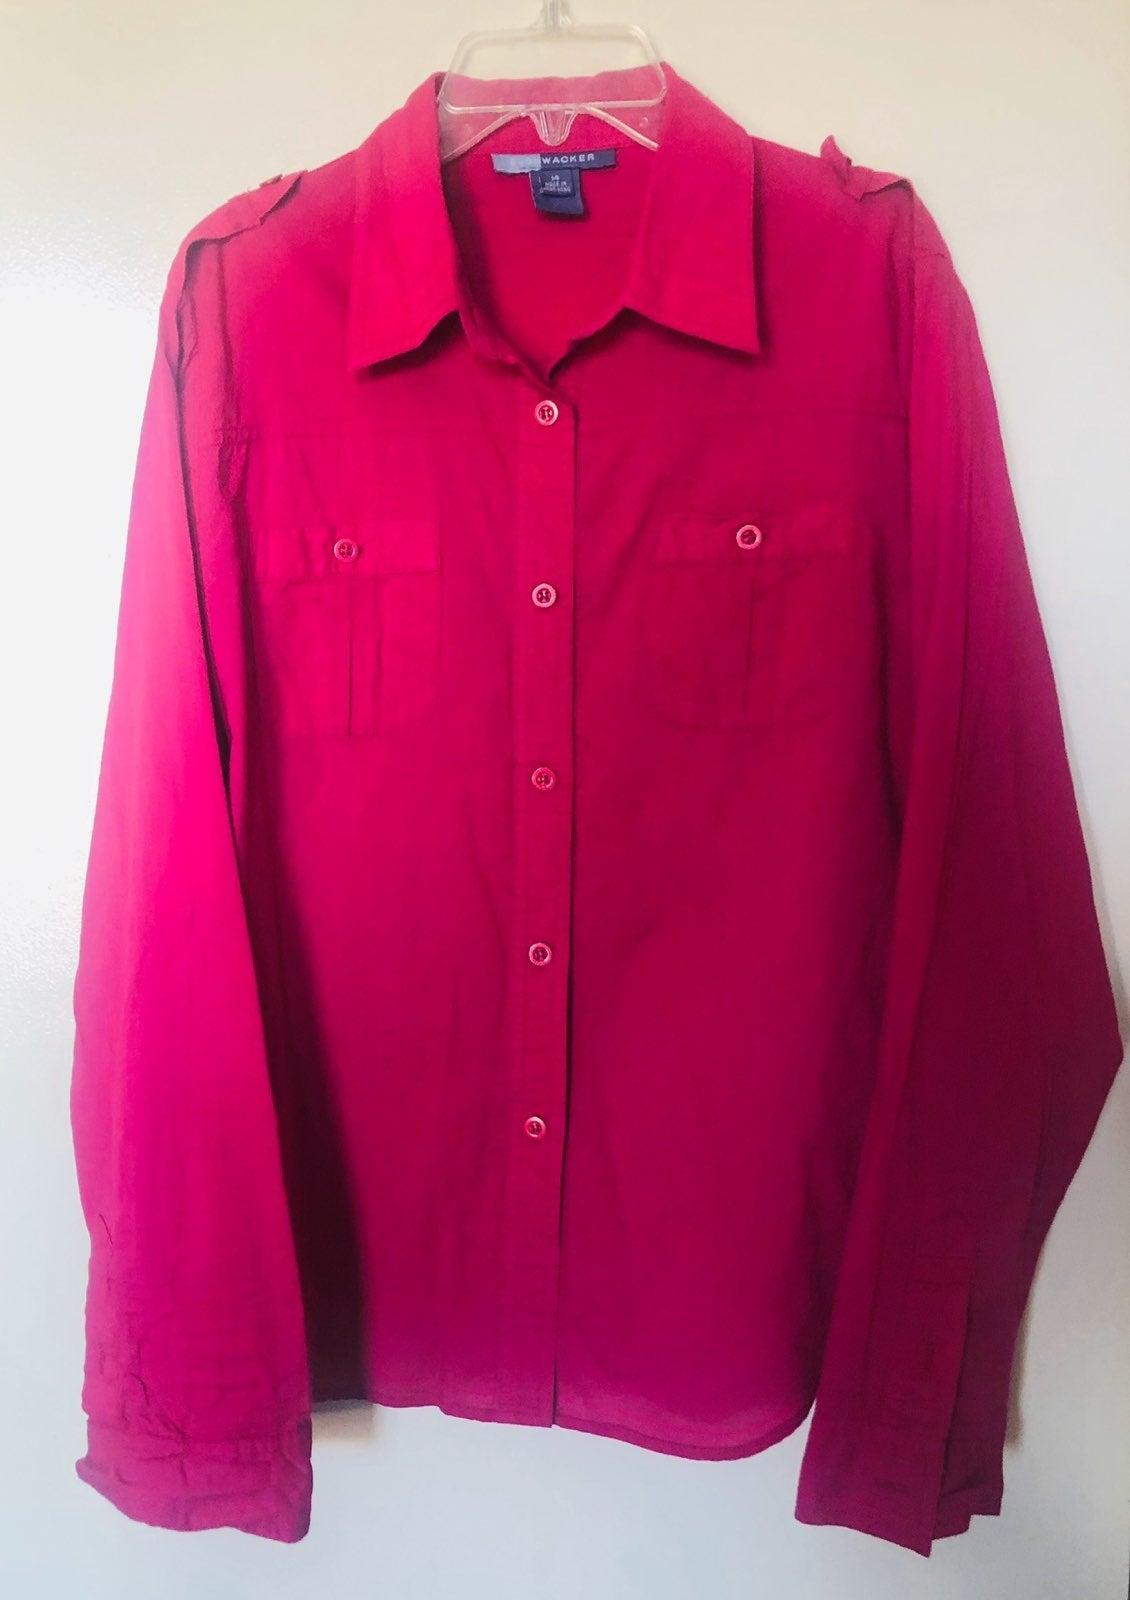 Bushwacker Pink Long Sleeves Top Size 14